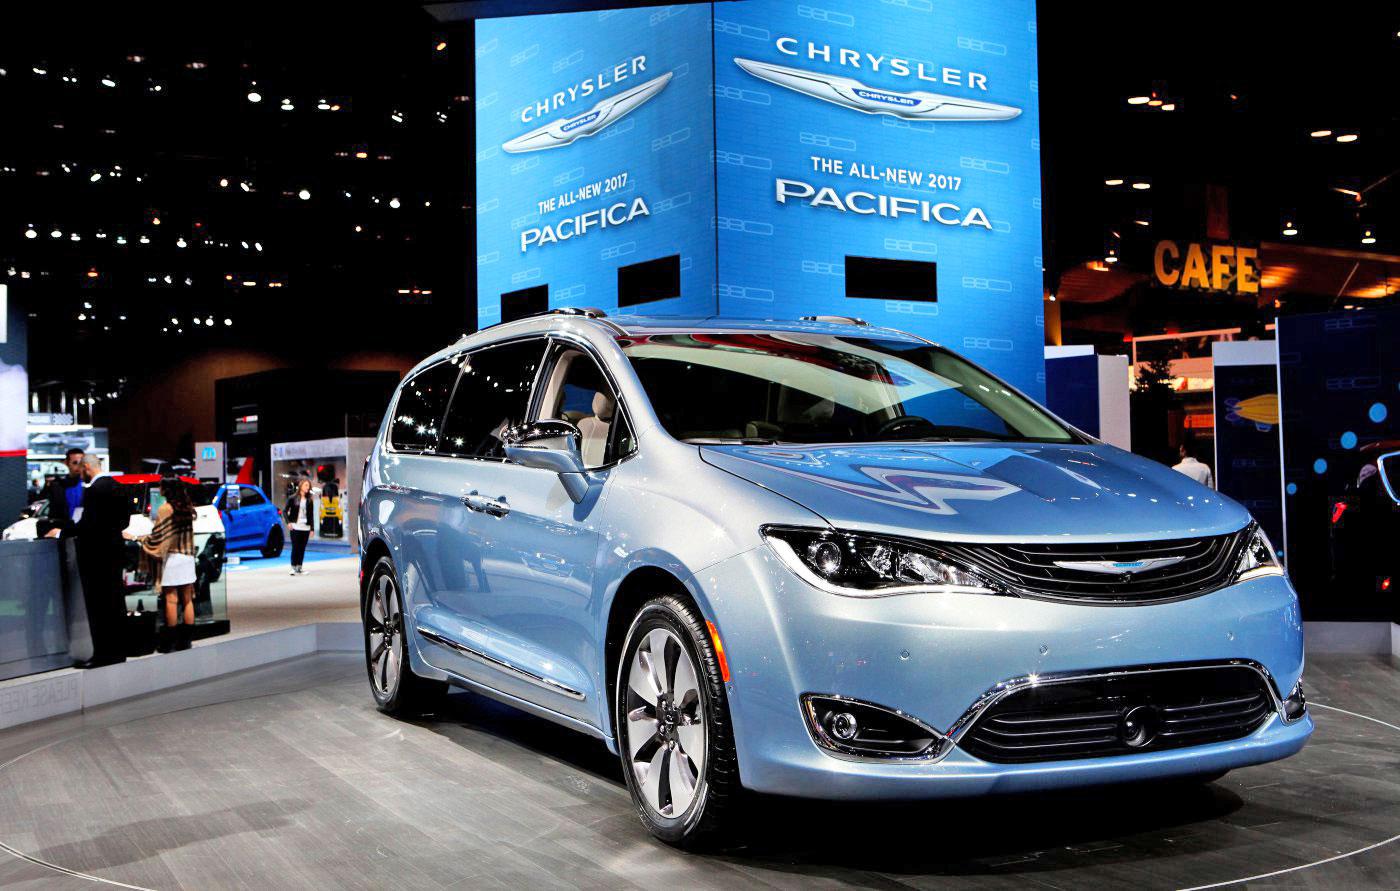 Google 39 S Self Driving Tech Goes Into Chrysler Minivans